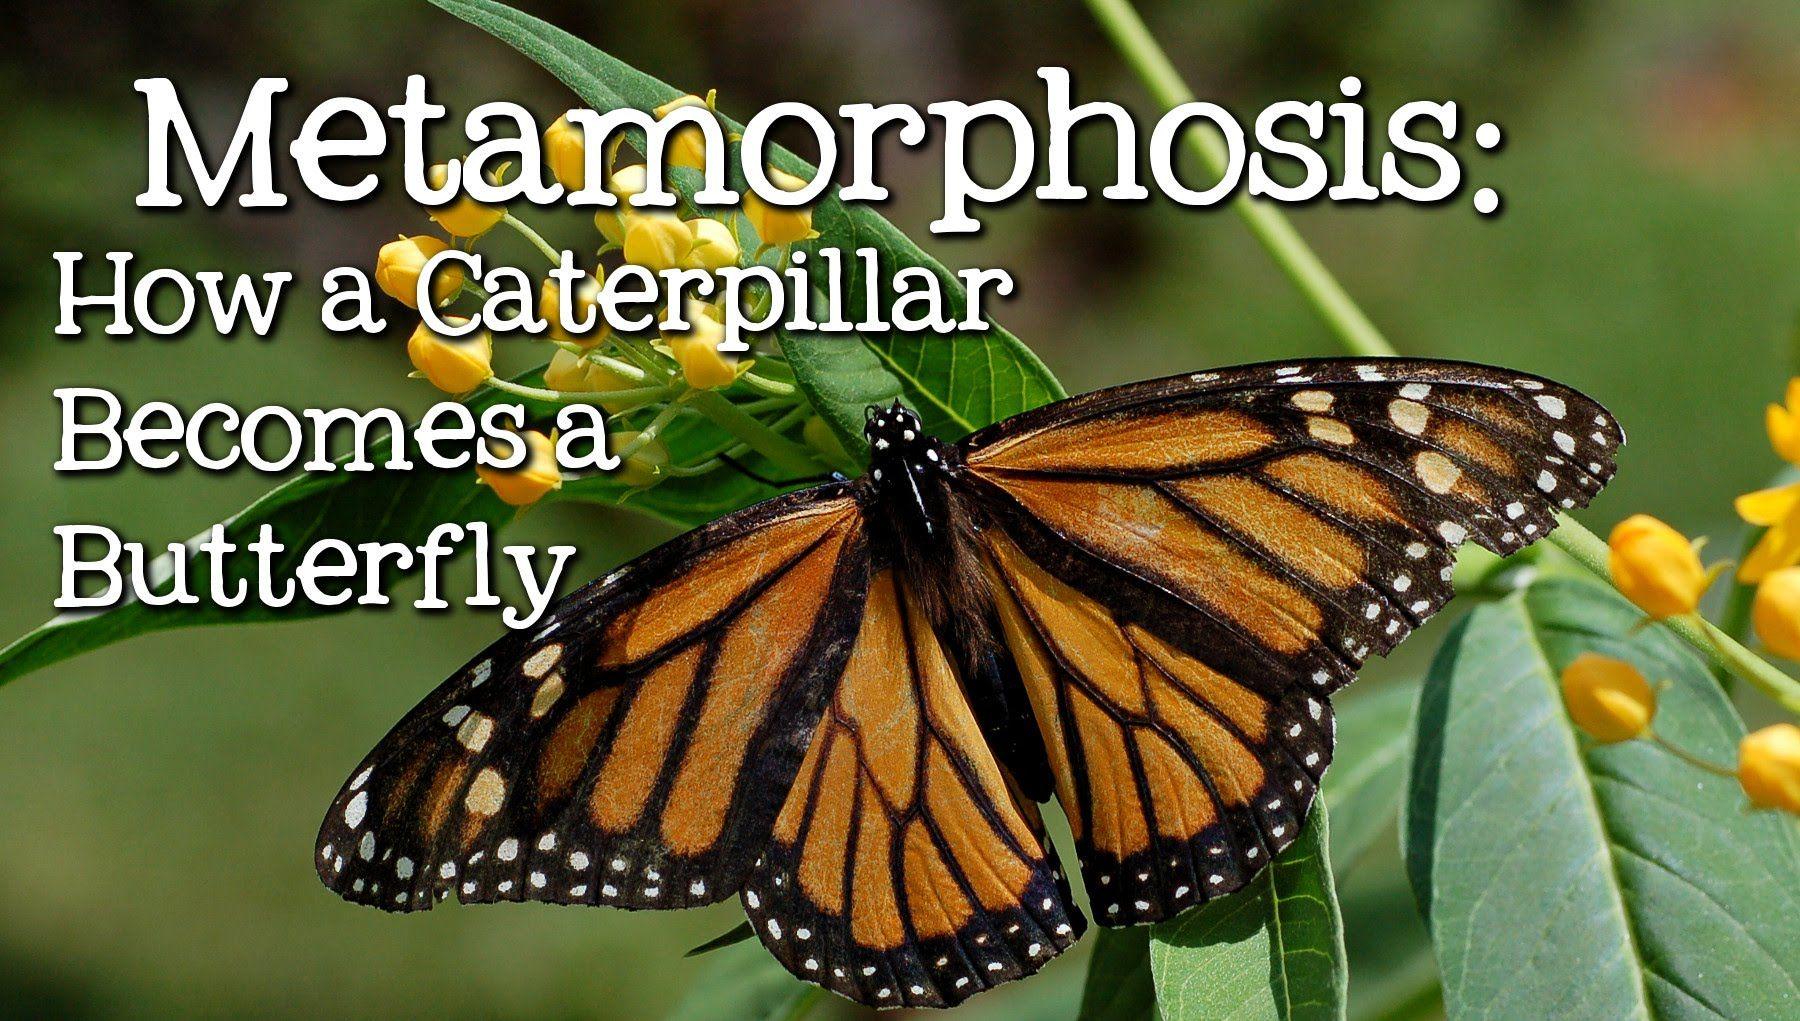 Metamorphosis Caterpillar To Butterfly For Children